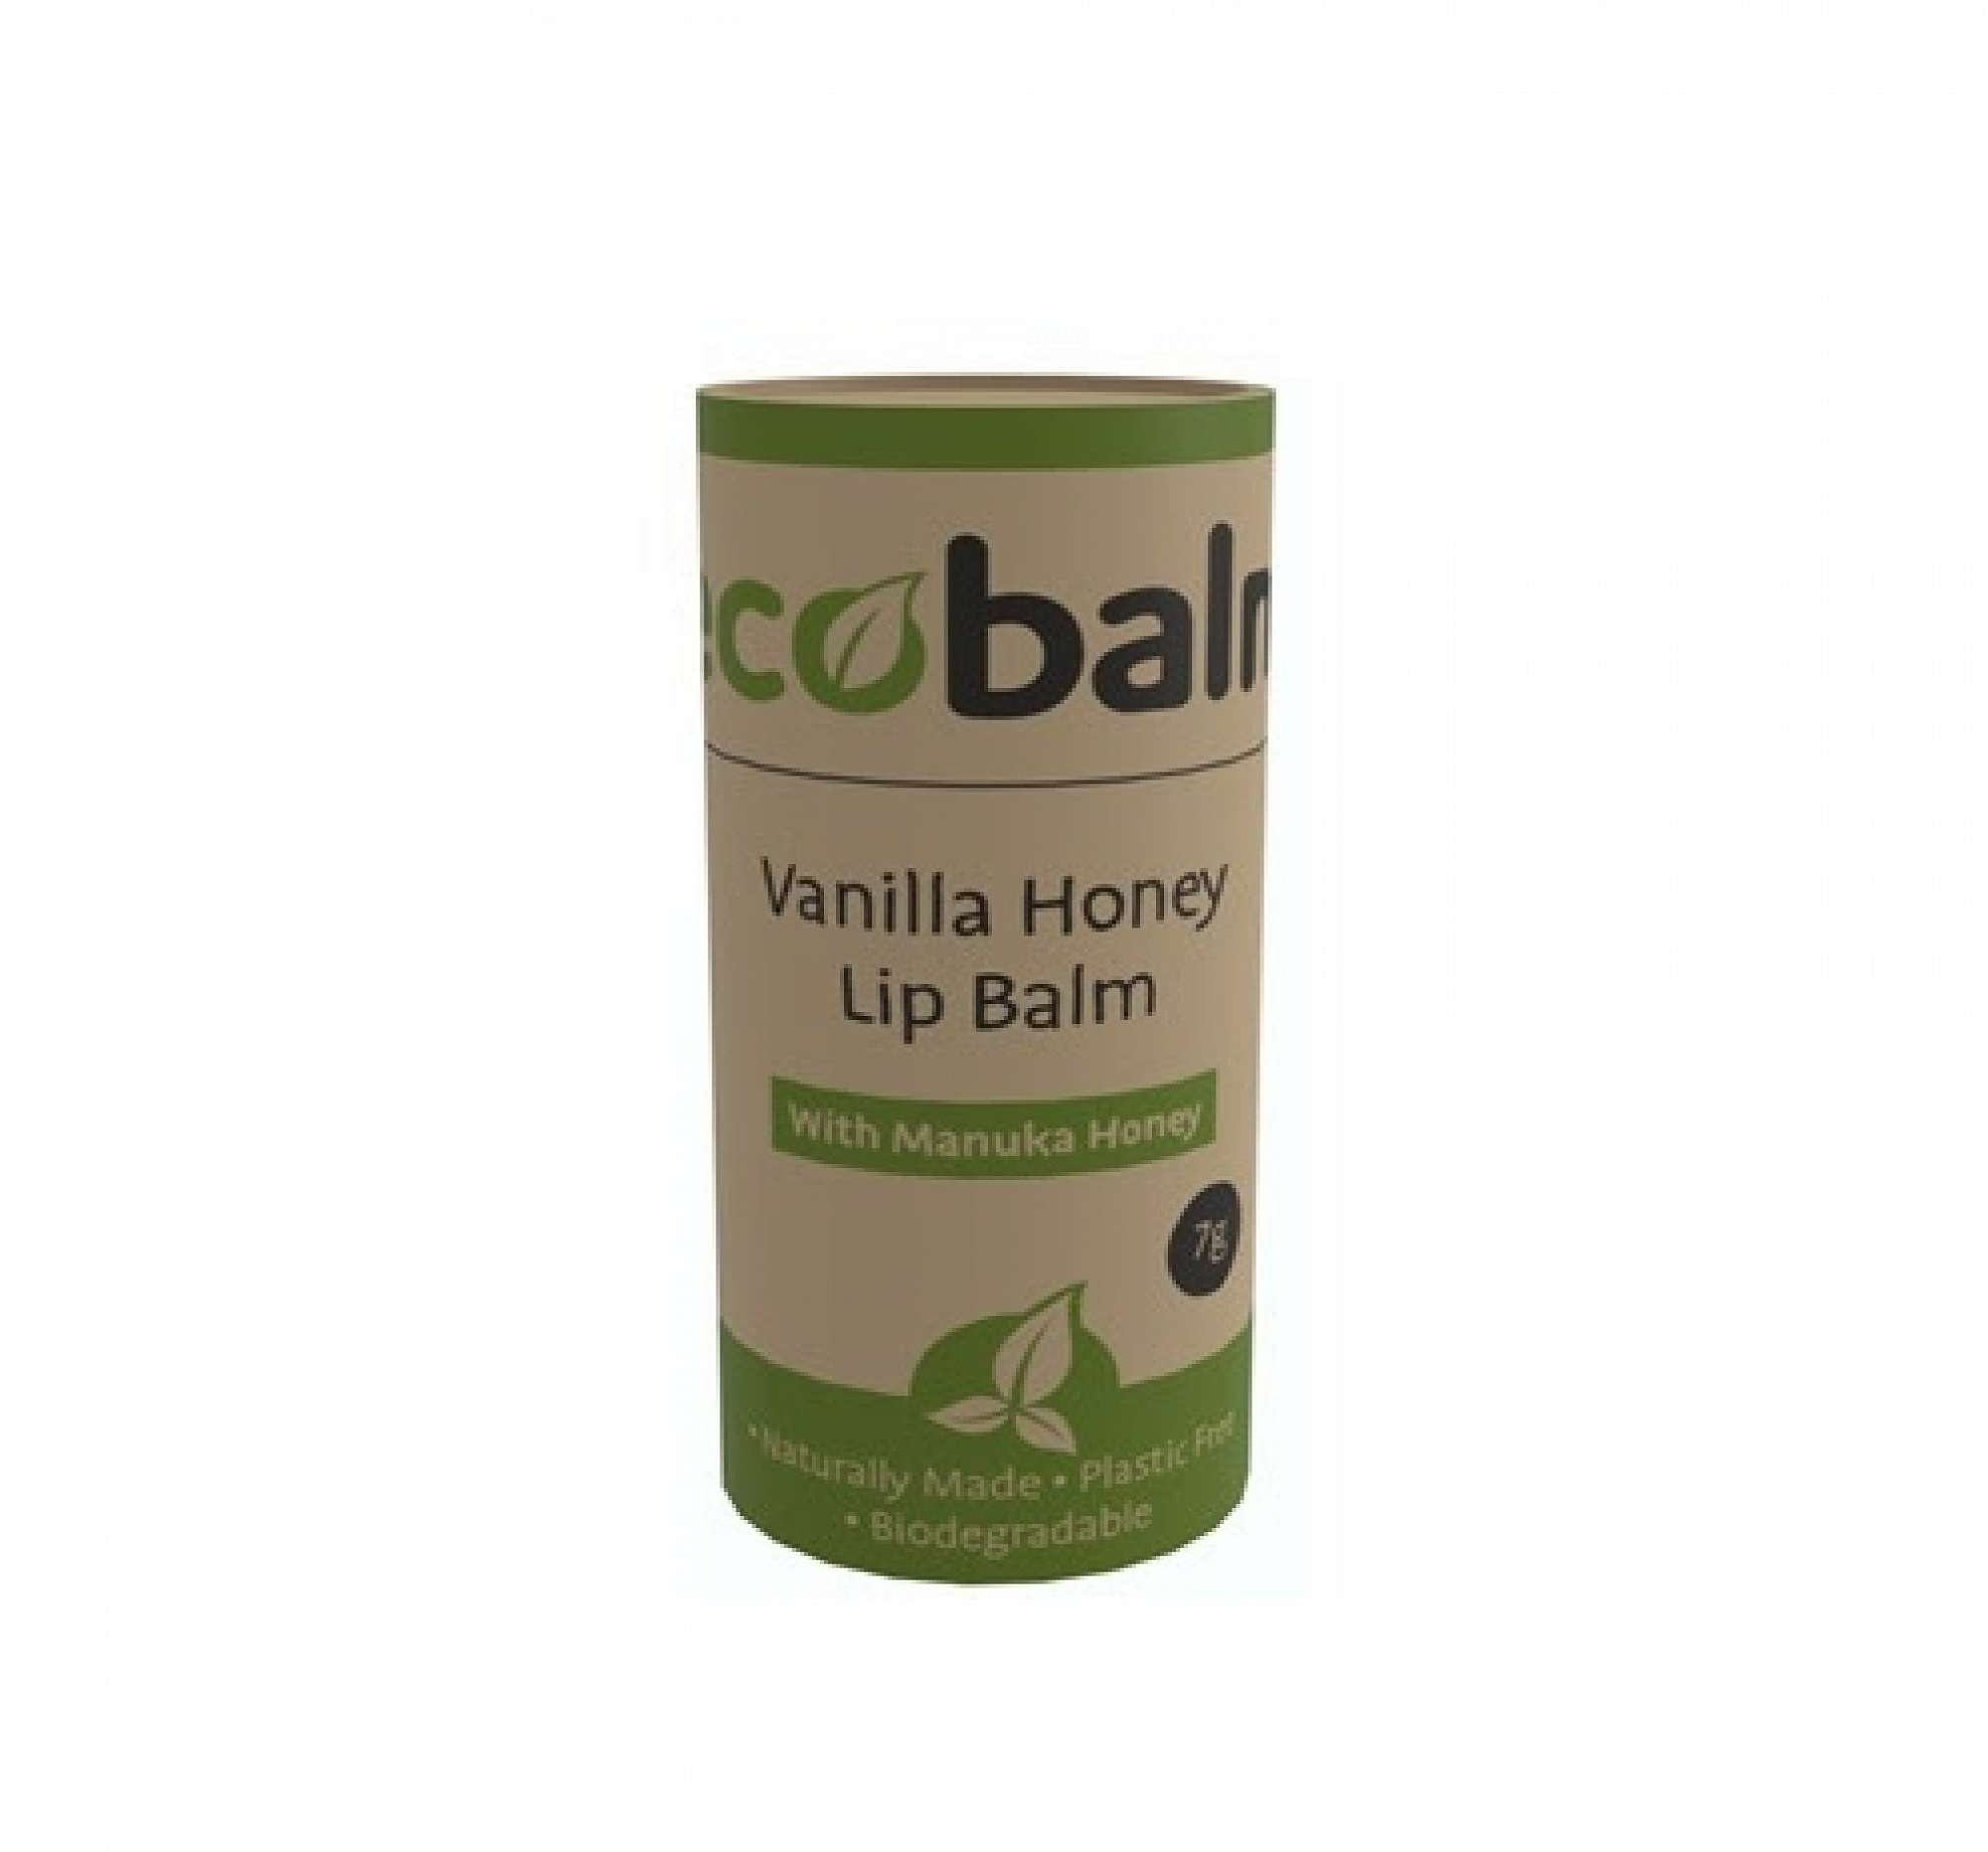 EcobalmVanilla Honey Lip Balm